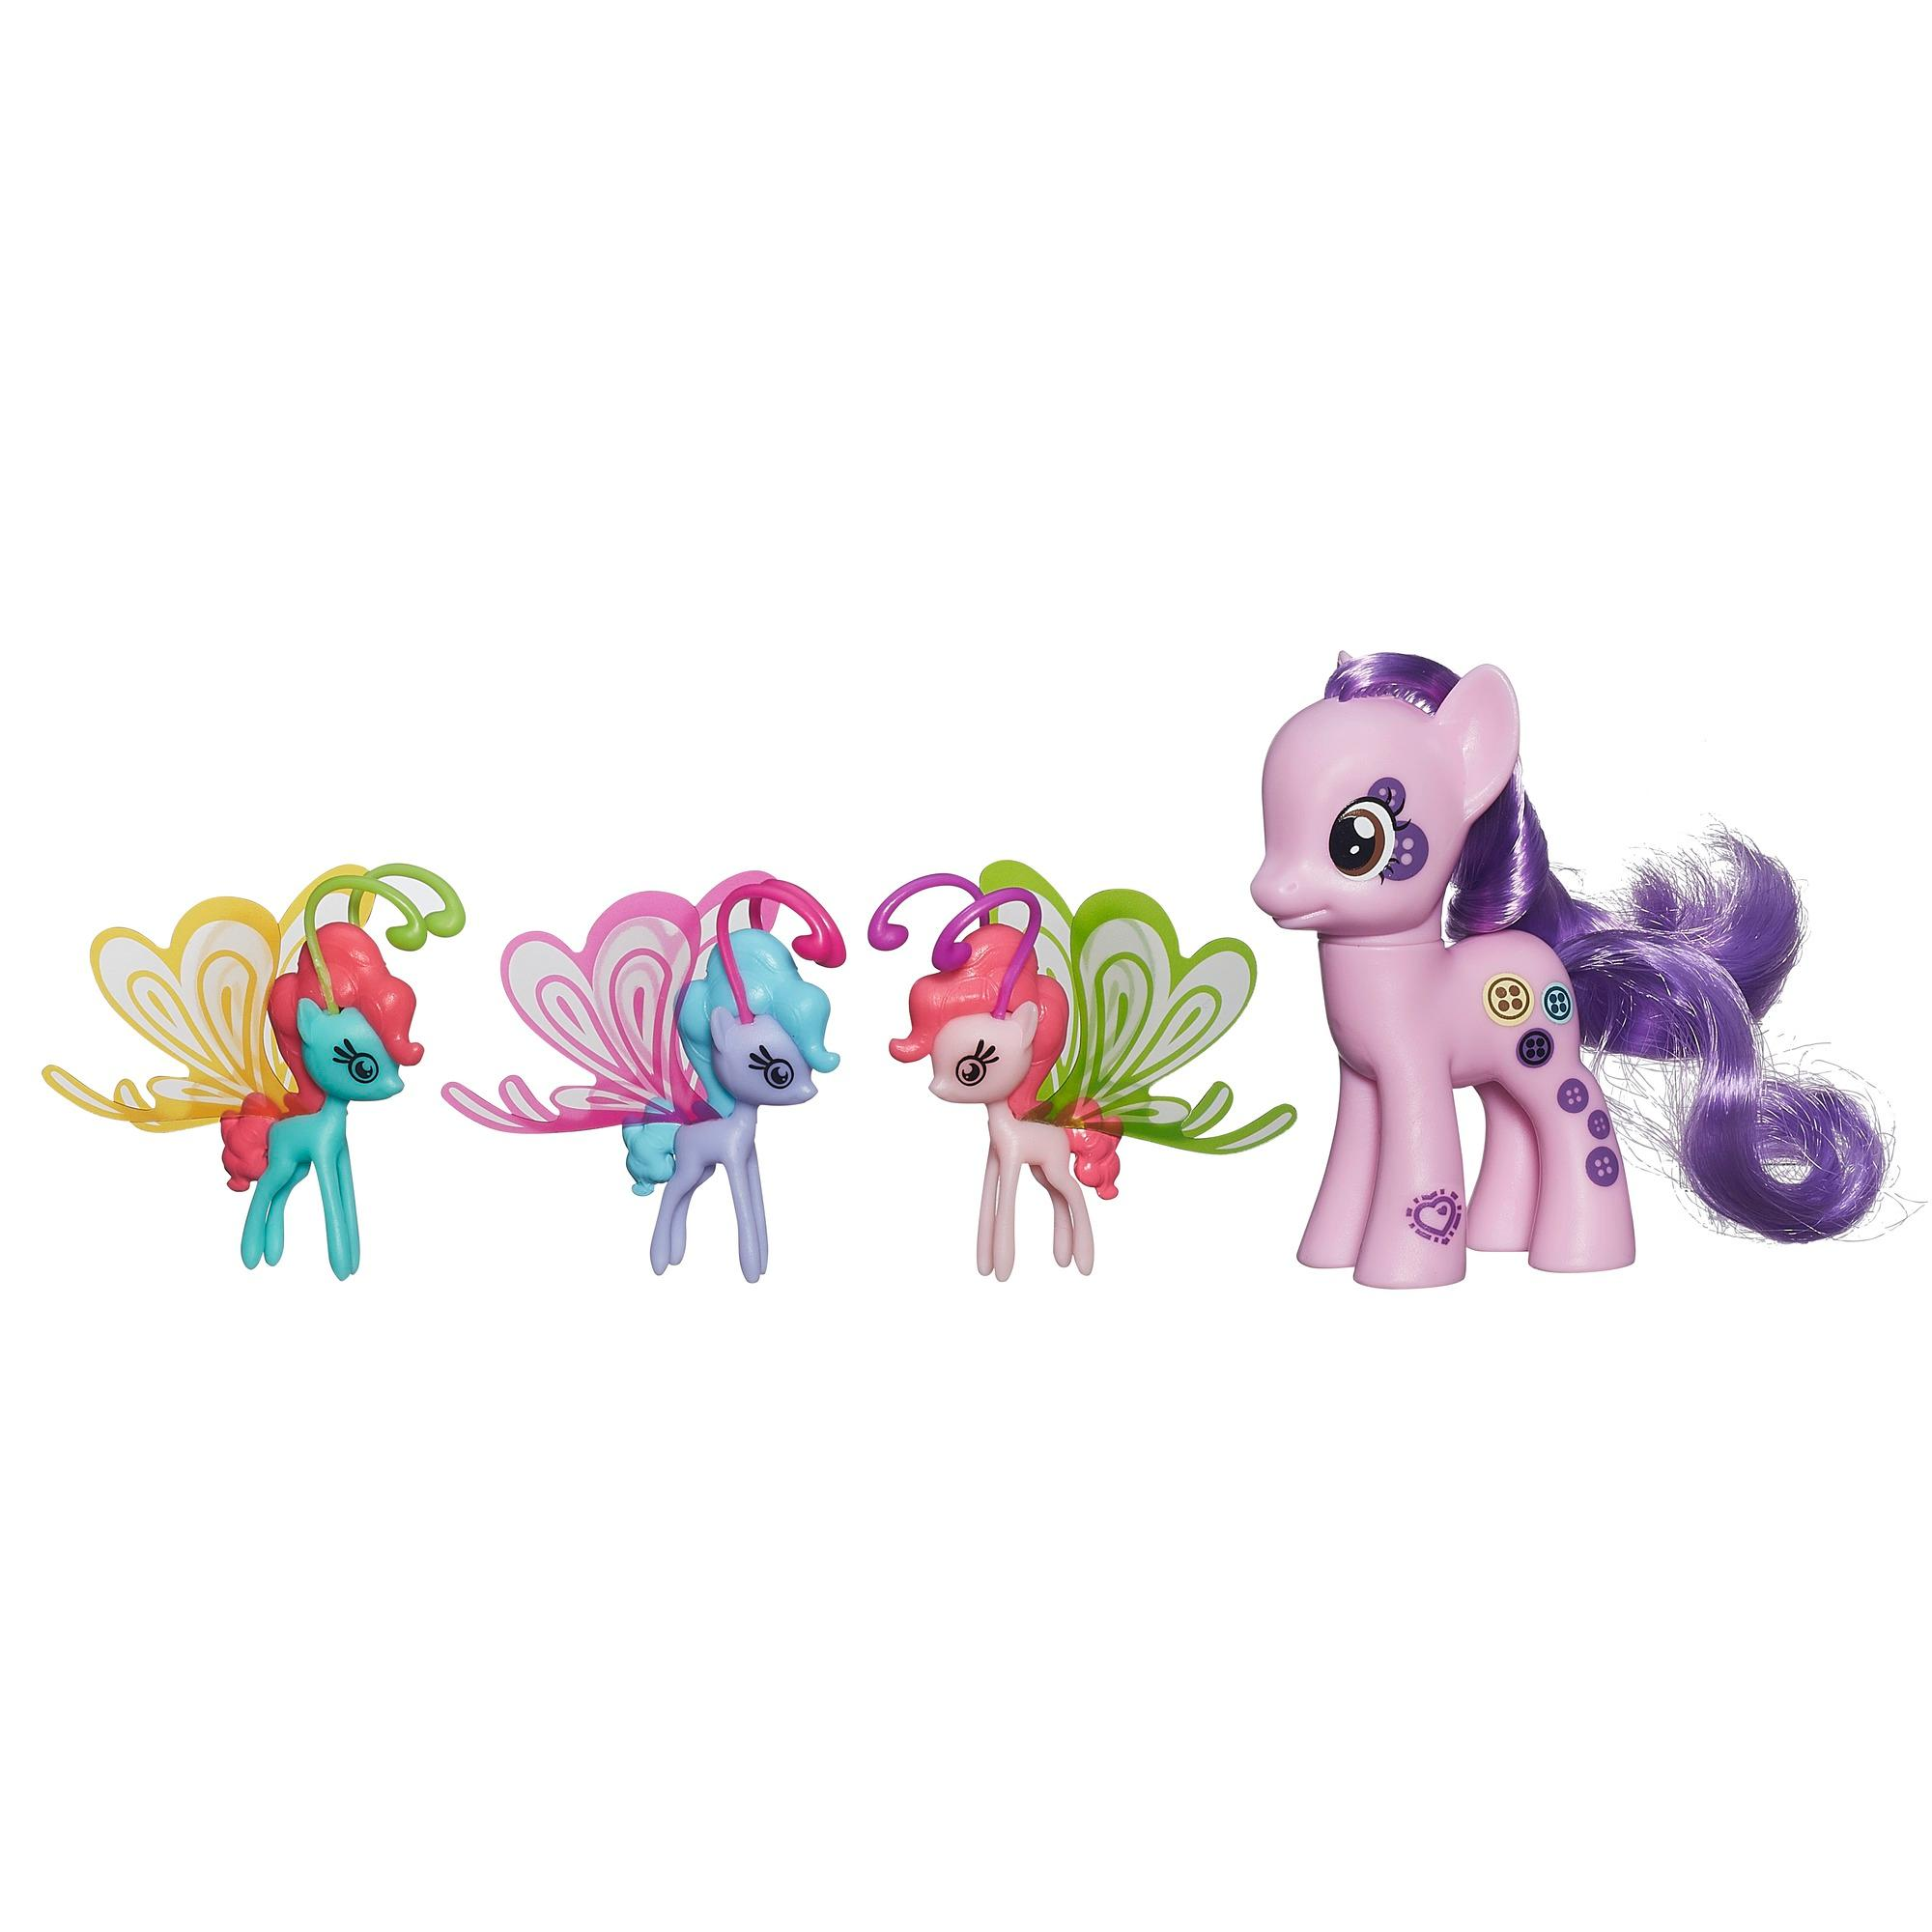 My Little Pony Cutie Mark Magic Buttonbelle & Friendship Flutters Figures